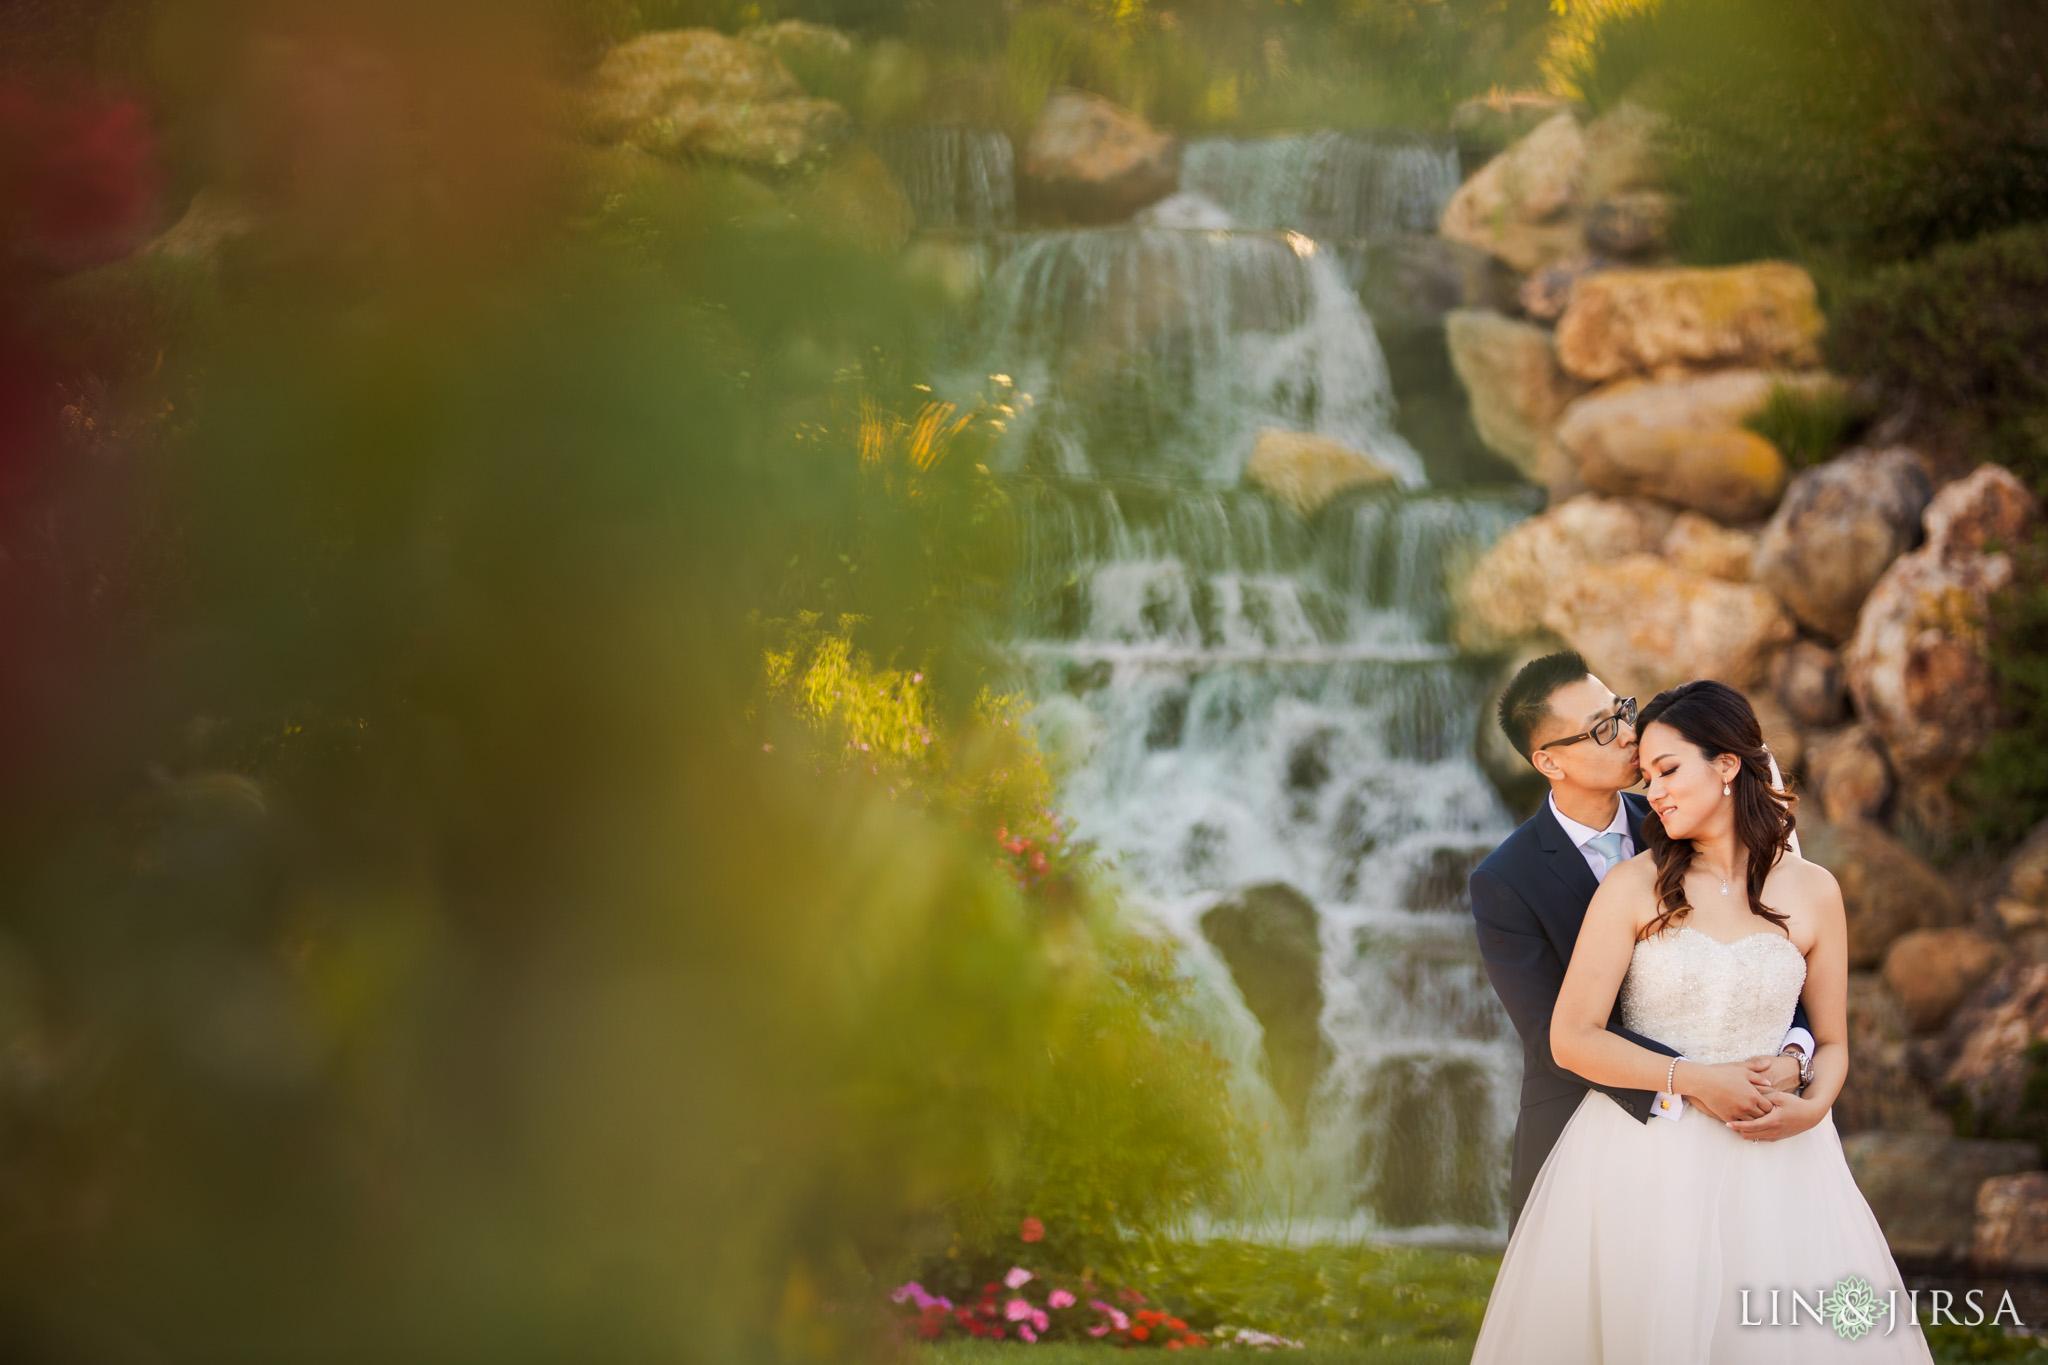 028 sherwood country club ventura county wedding photography